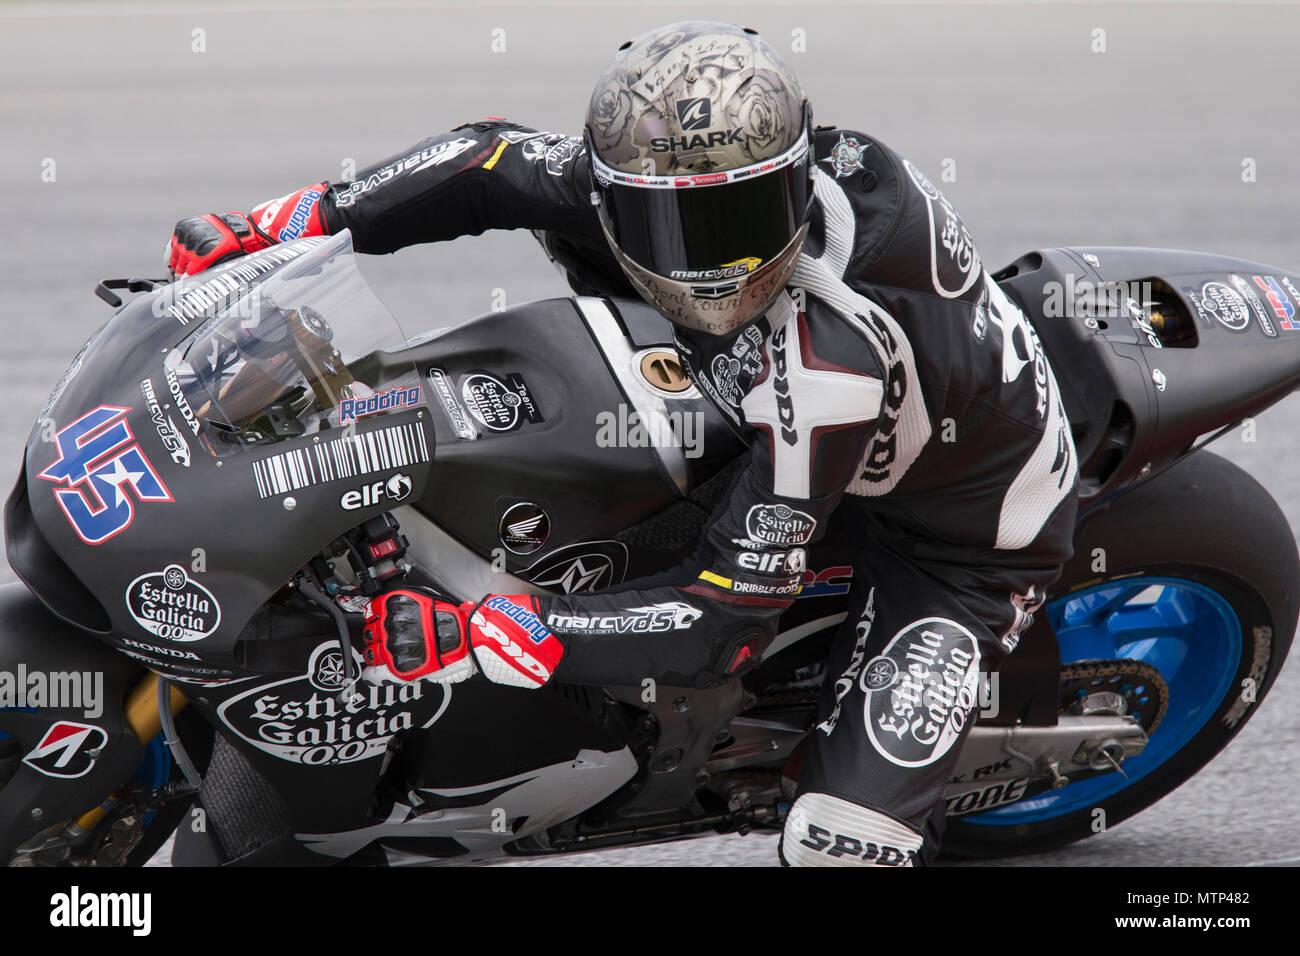 Britain's Scott Redding astride his Honda RCV factory bike